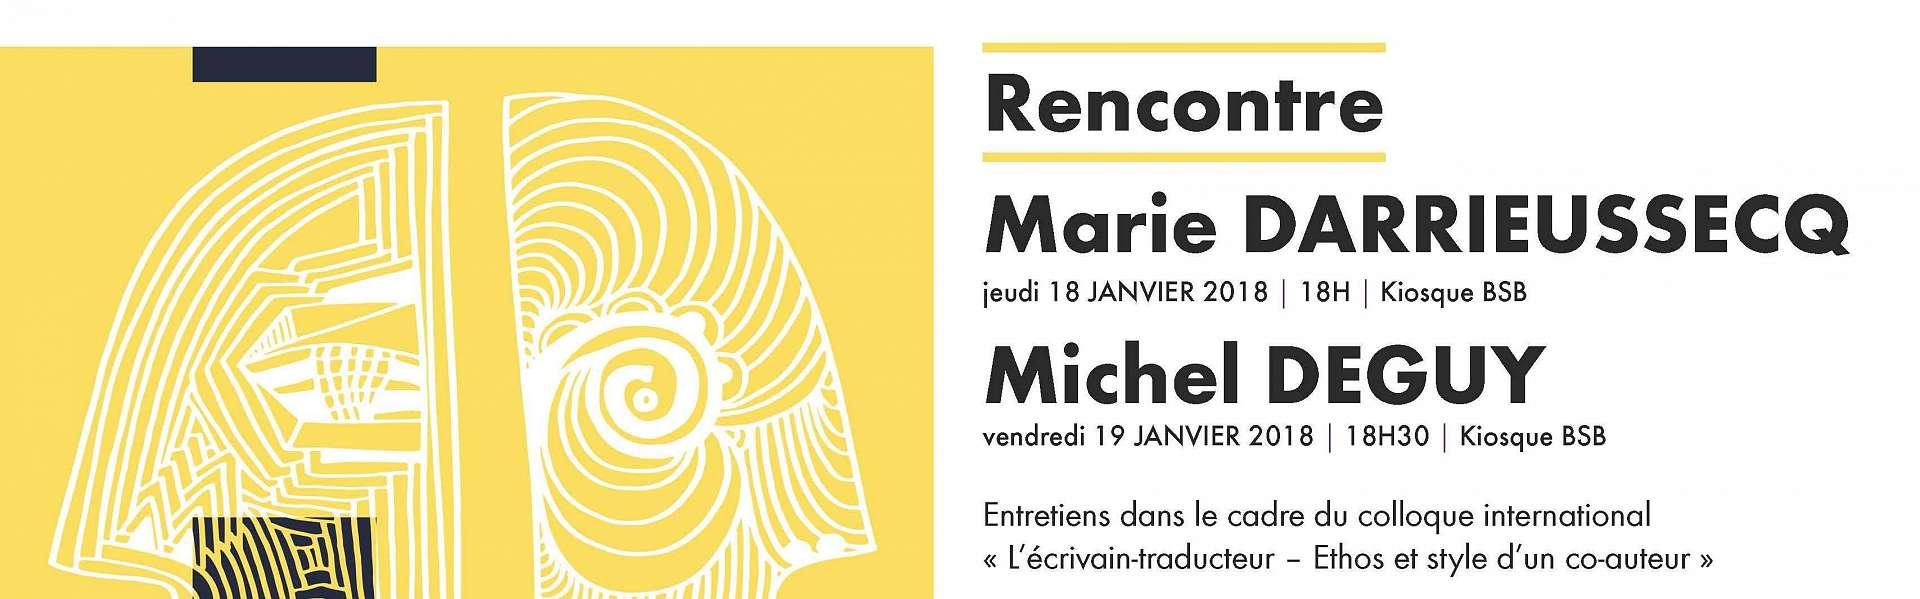 Rencontre Marie Darrieussecq Michel Deguy BSB